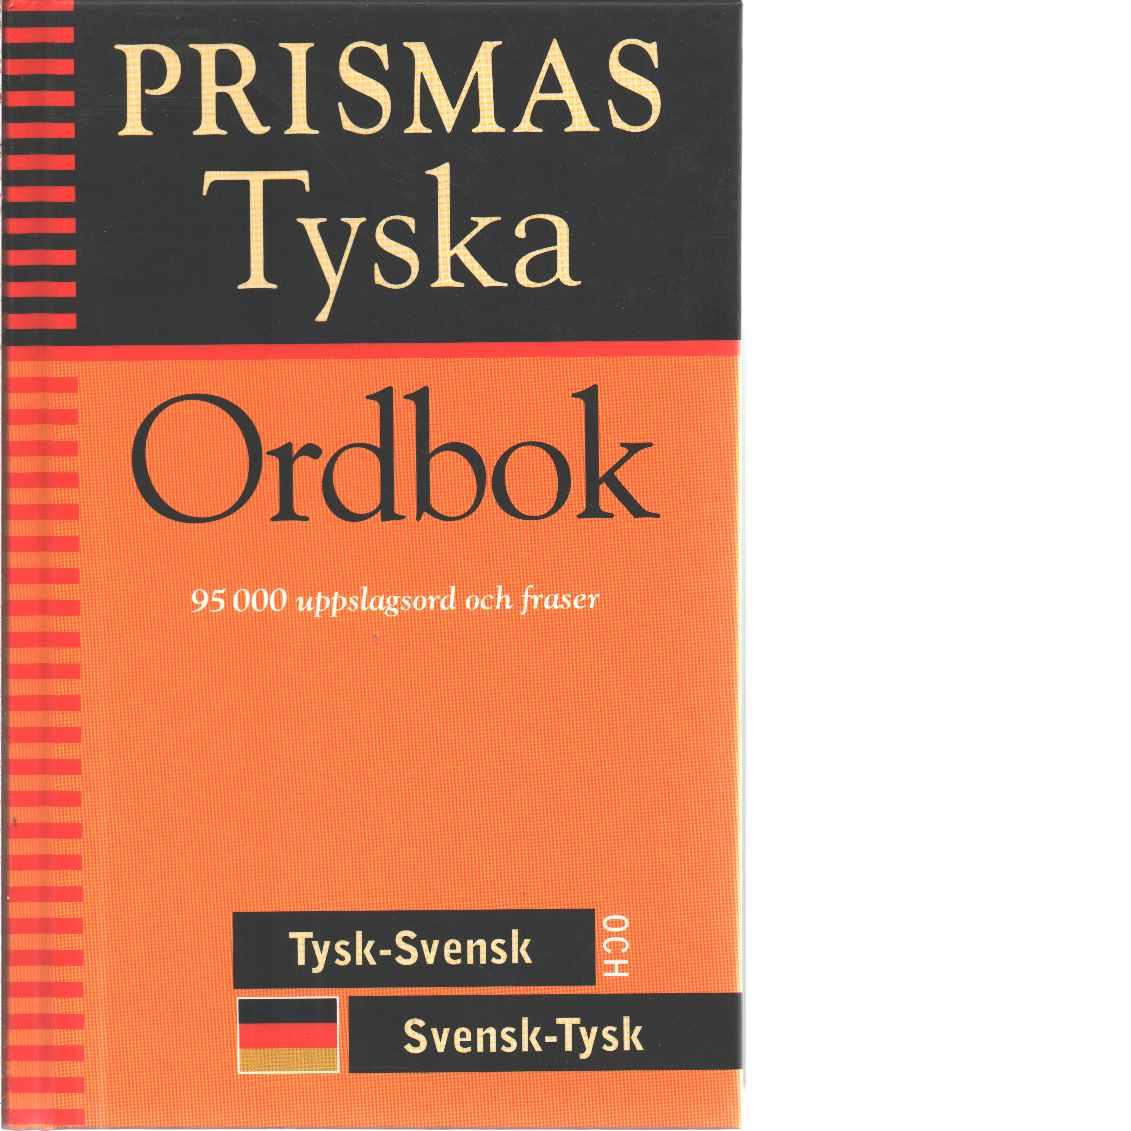 Prismas tyska ordbok  - Red.